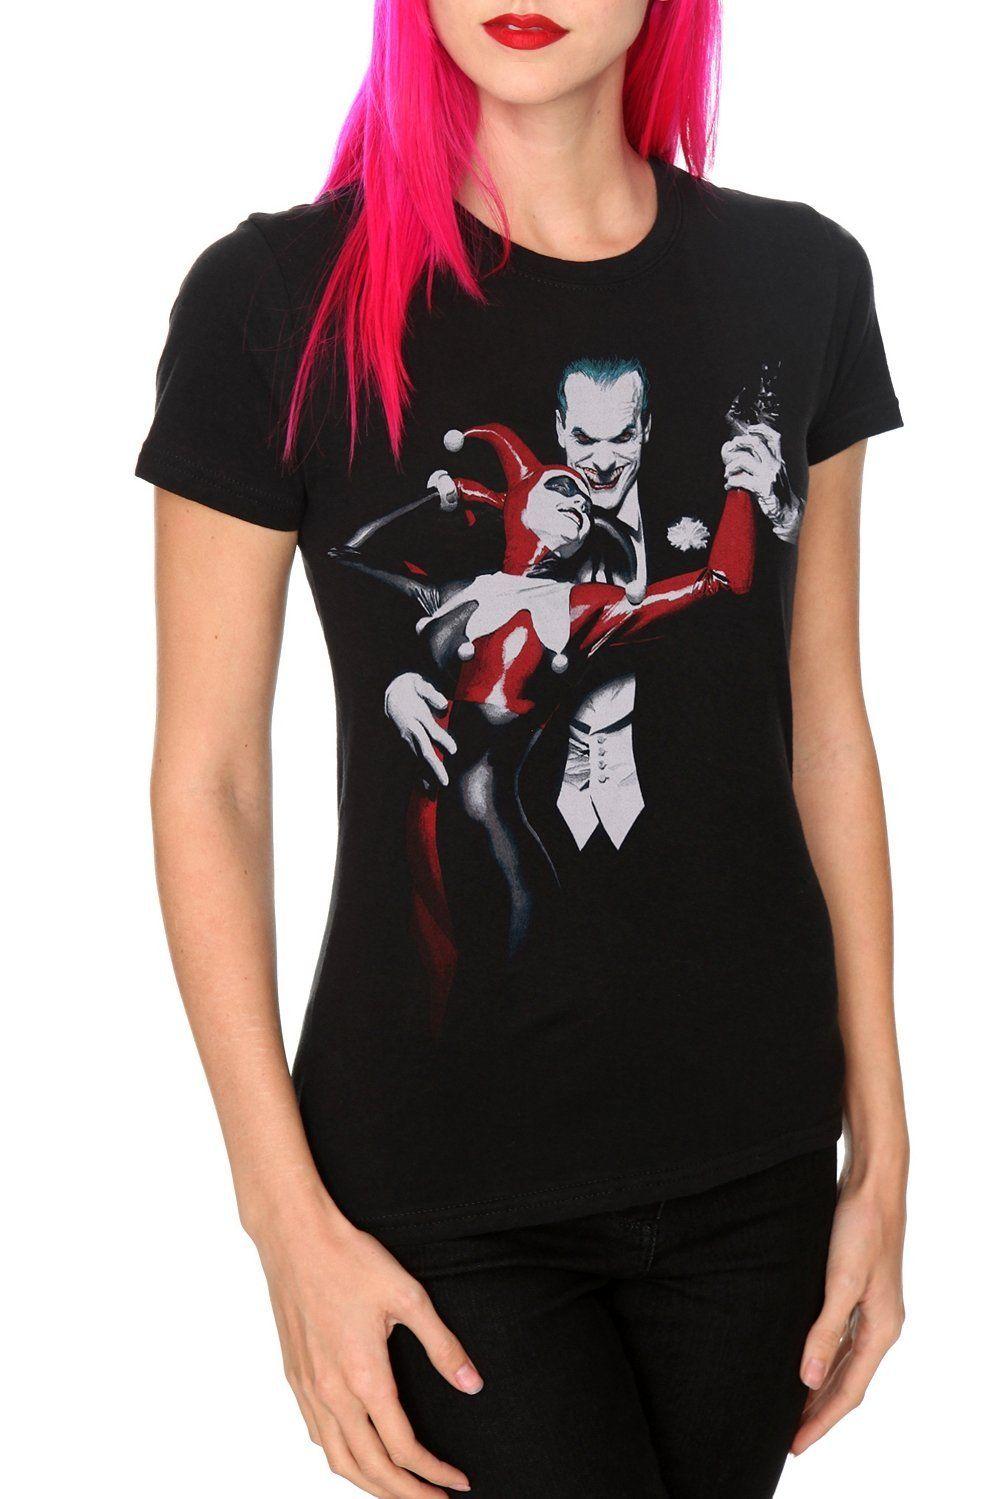 ceaaf671 Amazon.com: DC Comics Batman Harley Quinn And Joker Girls T-Shirt Plus Size  3XL: Clothing